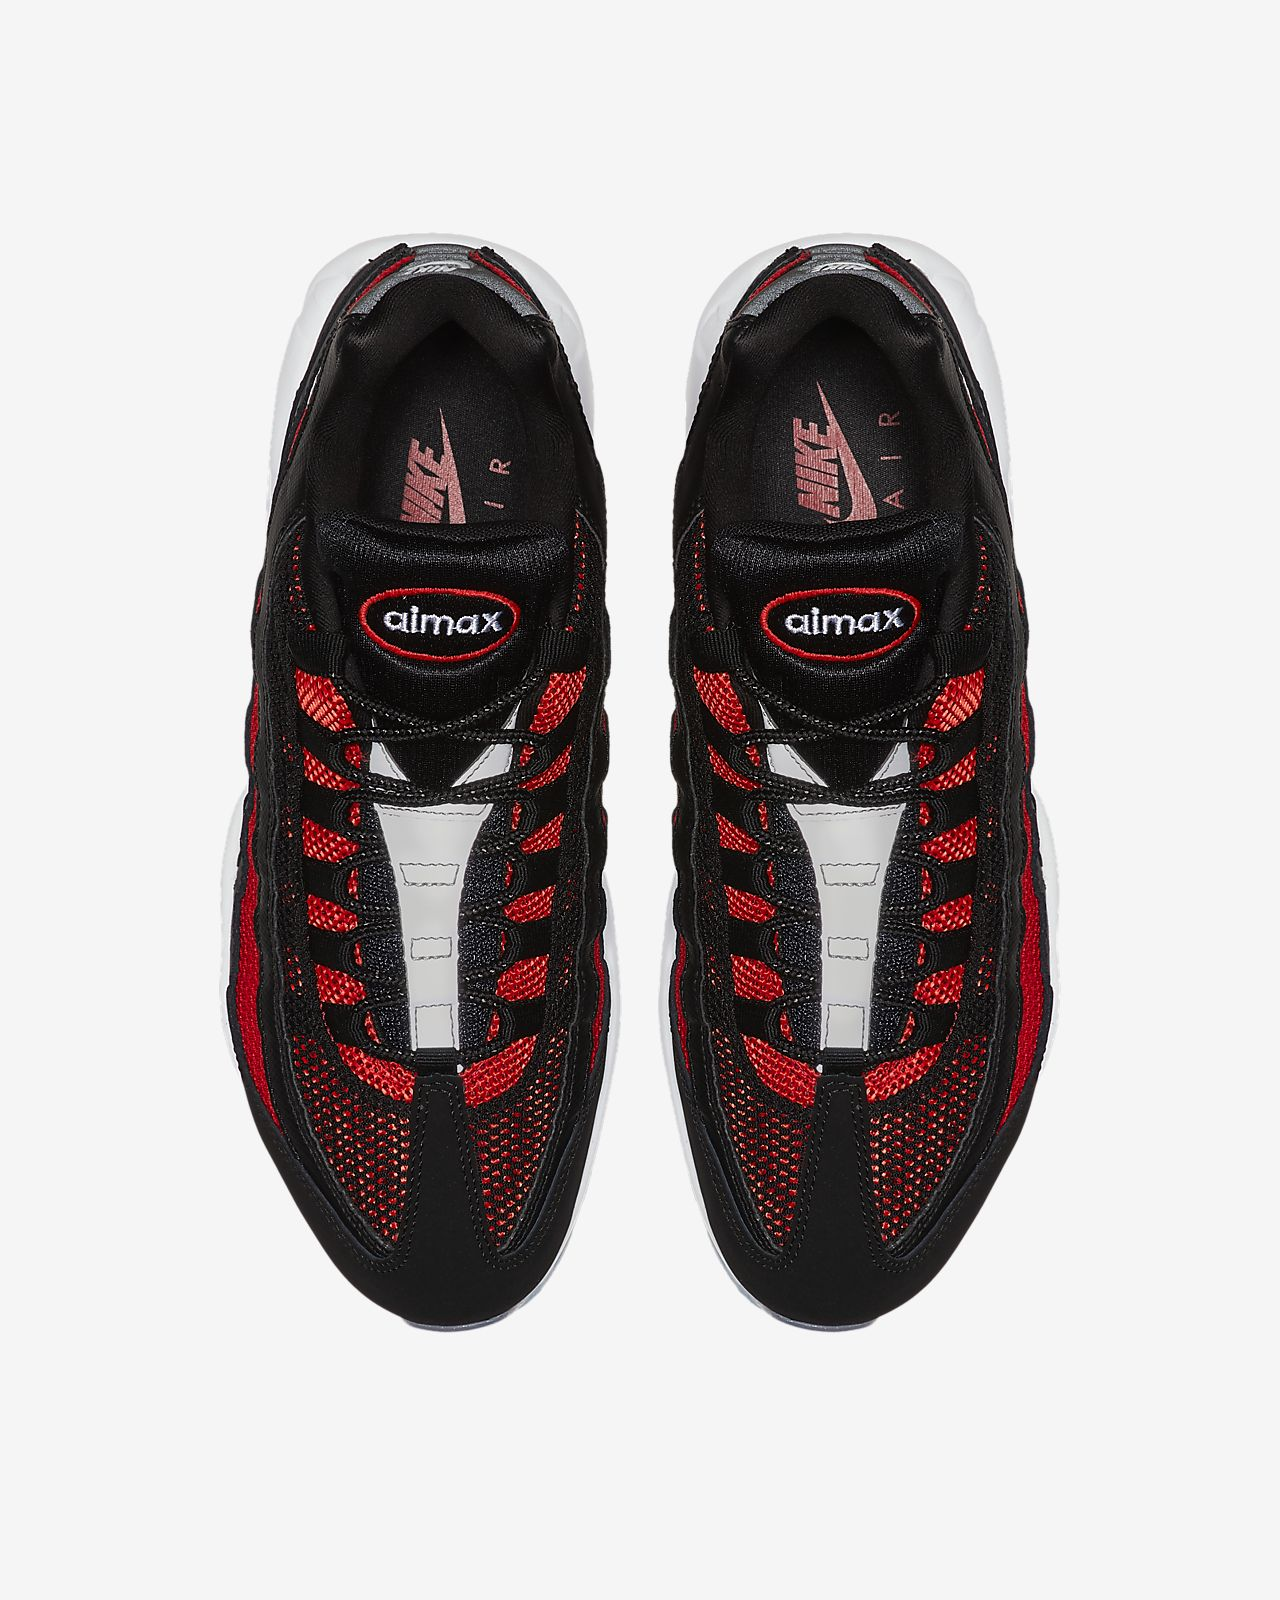 online retailer ffcb7 baead ... Nike Air Max 95 Essential Men s Shoe